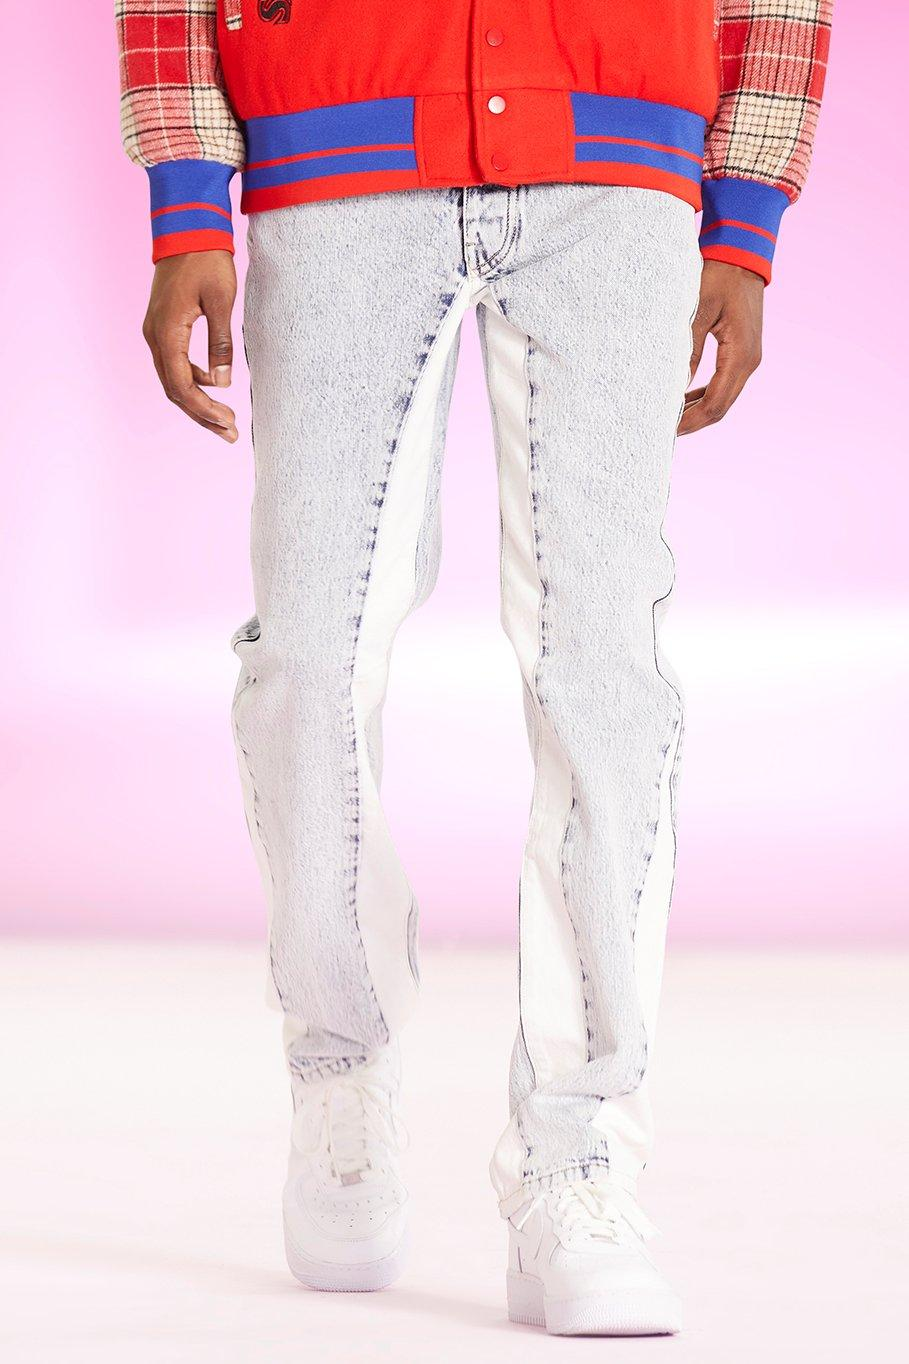 Men's Vintage Pants, Trousers, Jeans, Overalls Mens Straight Leg Panel Jeans - Blue $27.00 AT vintagedancer.com